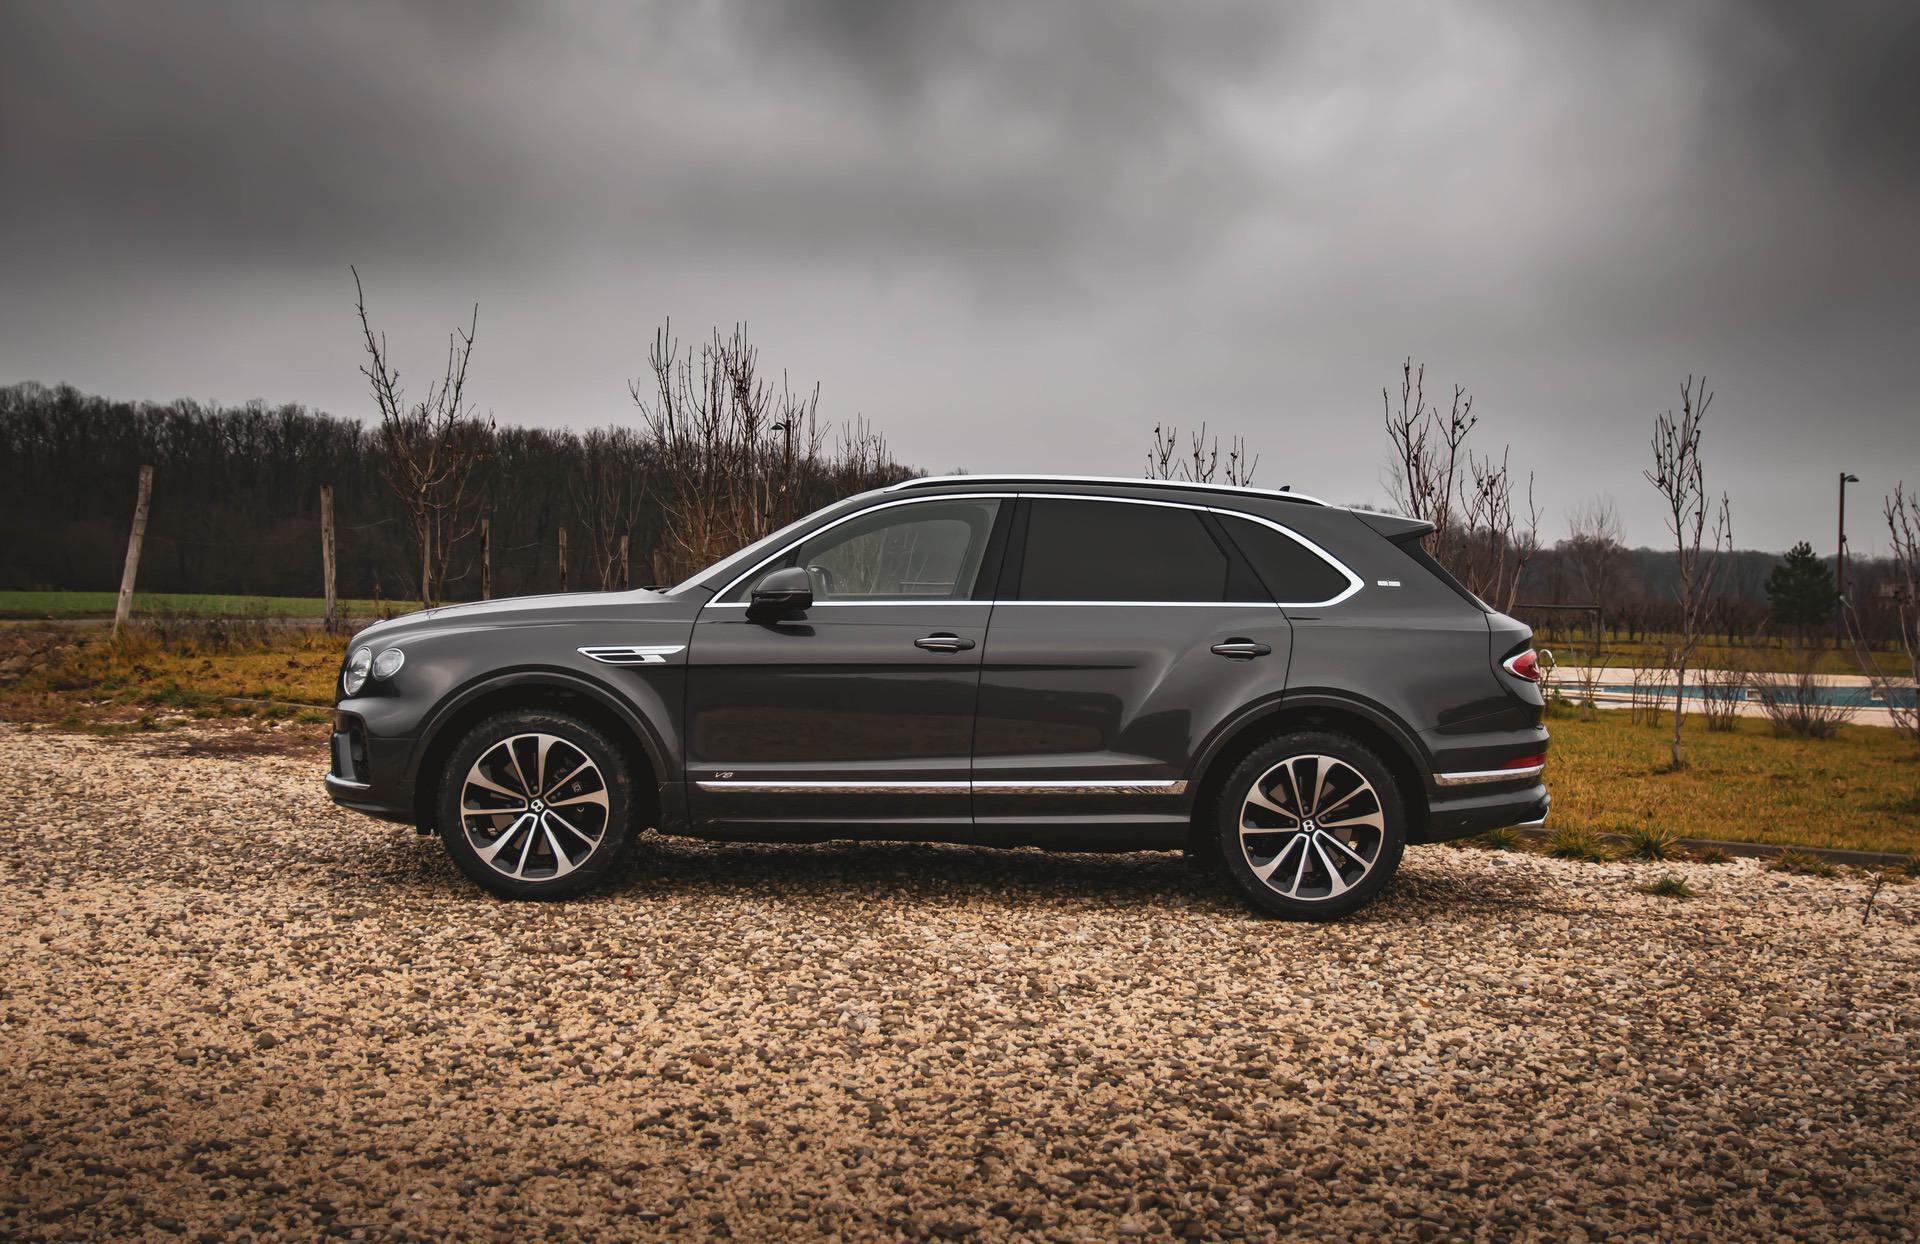 TEST DRIVE: 2020 Bentley Bentayga – Trailblazer refreshed